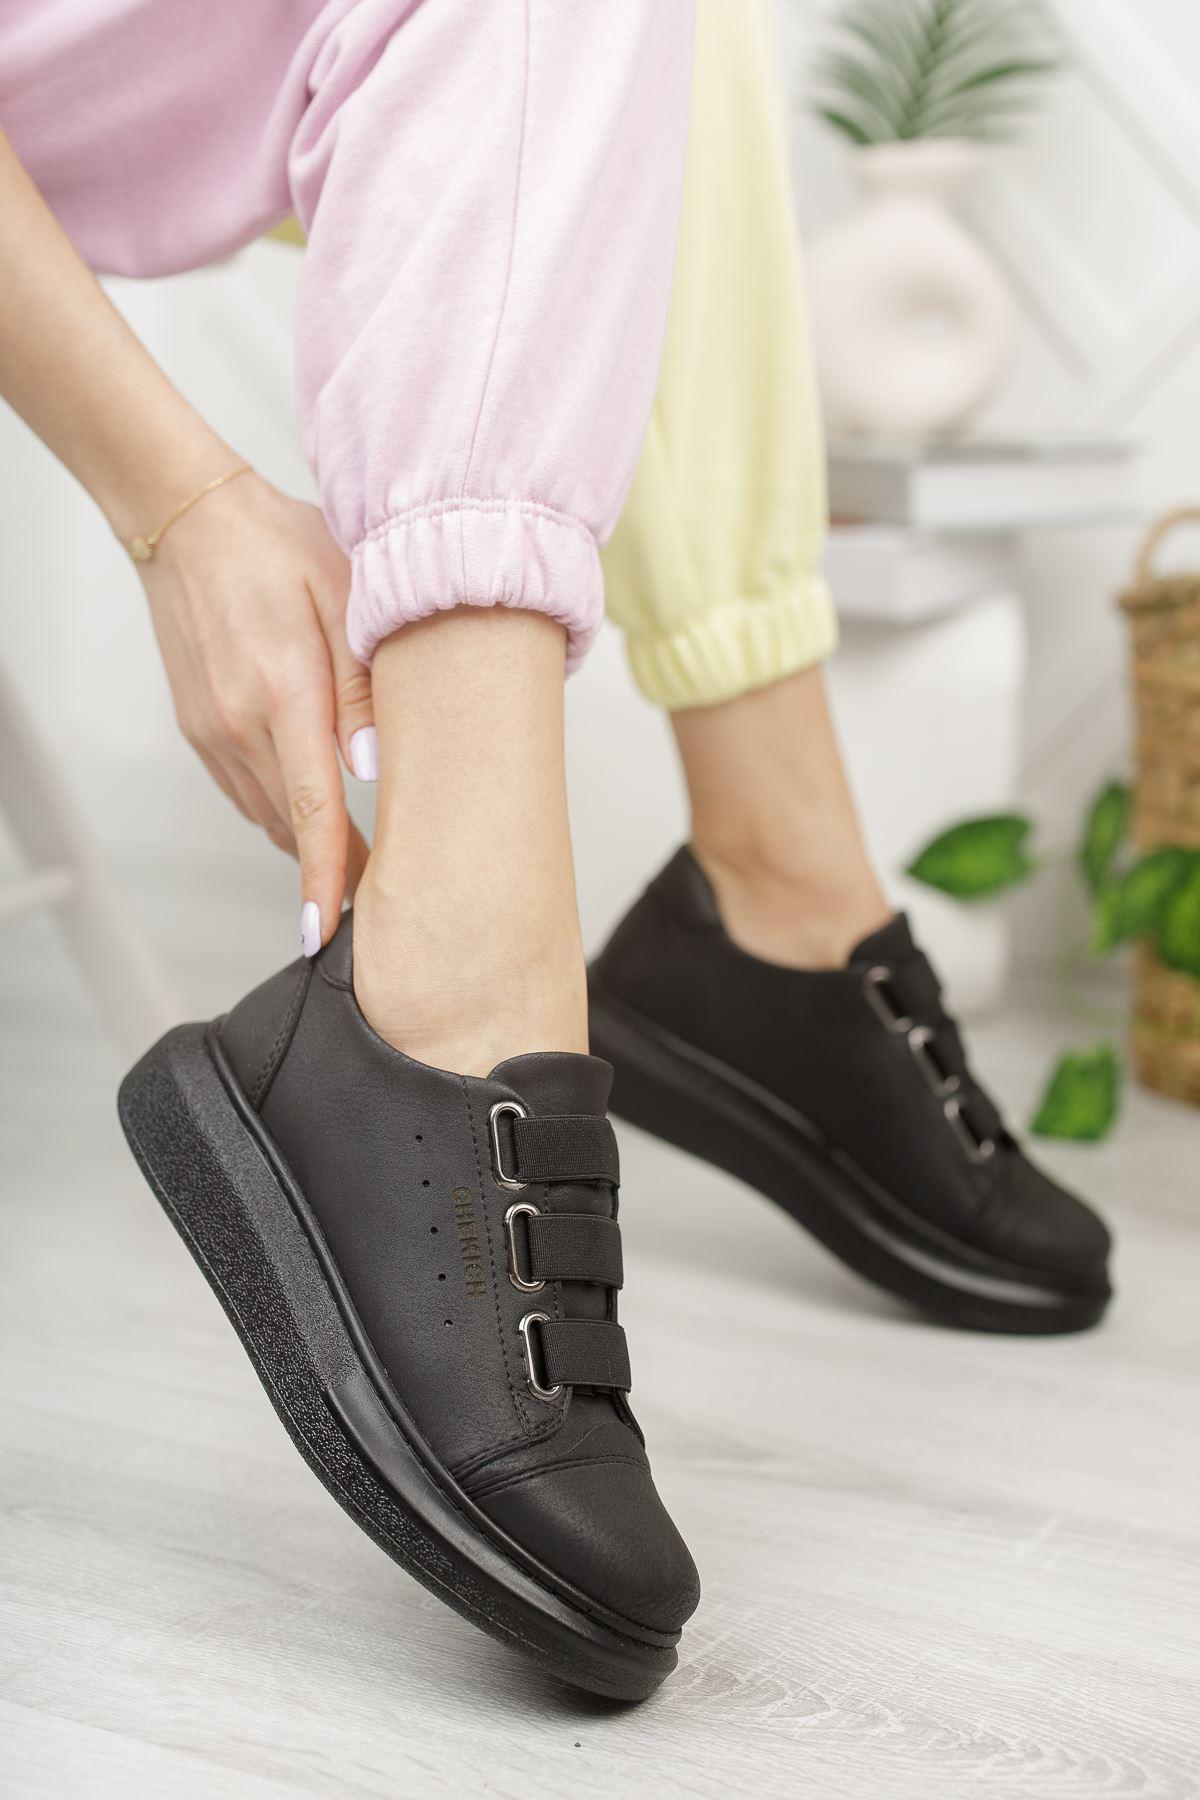 Chekich CH253 ST Kadın Ayakkabı SIYAH